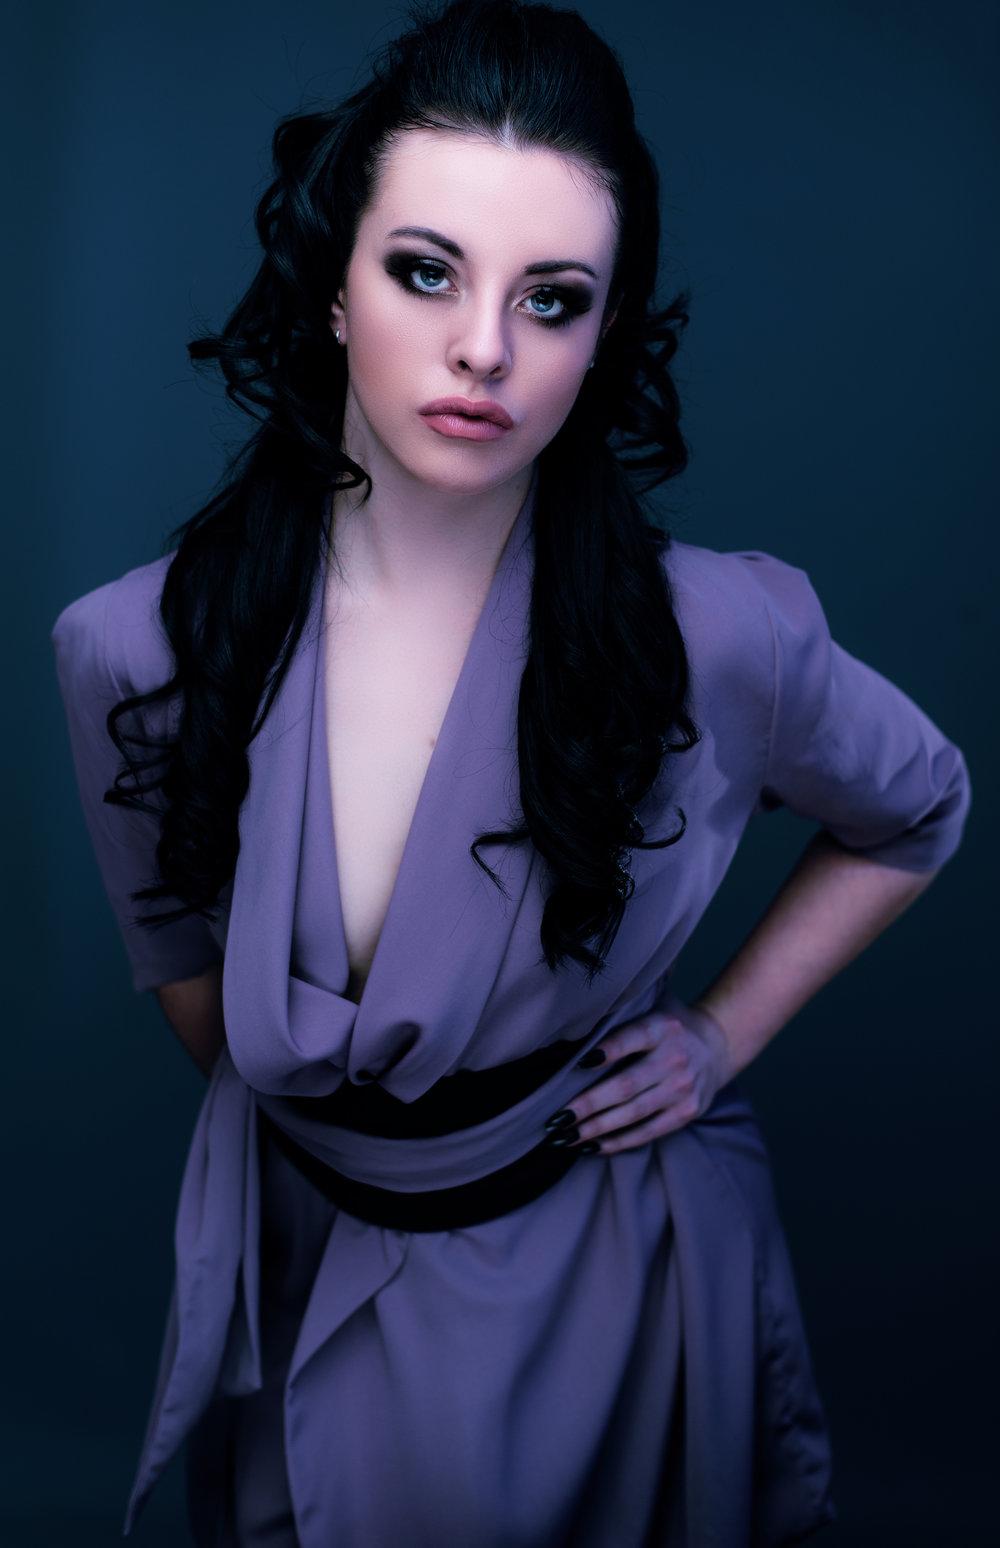 zaramia-ava-zaramiaava-leeds-fashion-designer-ethical-sustainable-tailored-minimalist-jacket-maika-mauve-black-obi-belt-dress-versatile-drape-cowl-styling-studio-womenswear-models-photoshoot-12